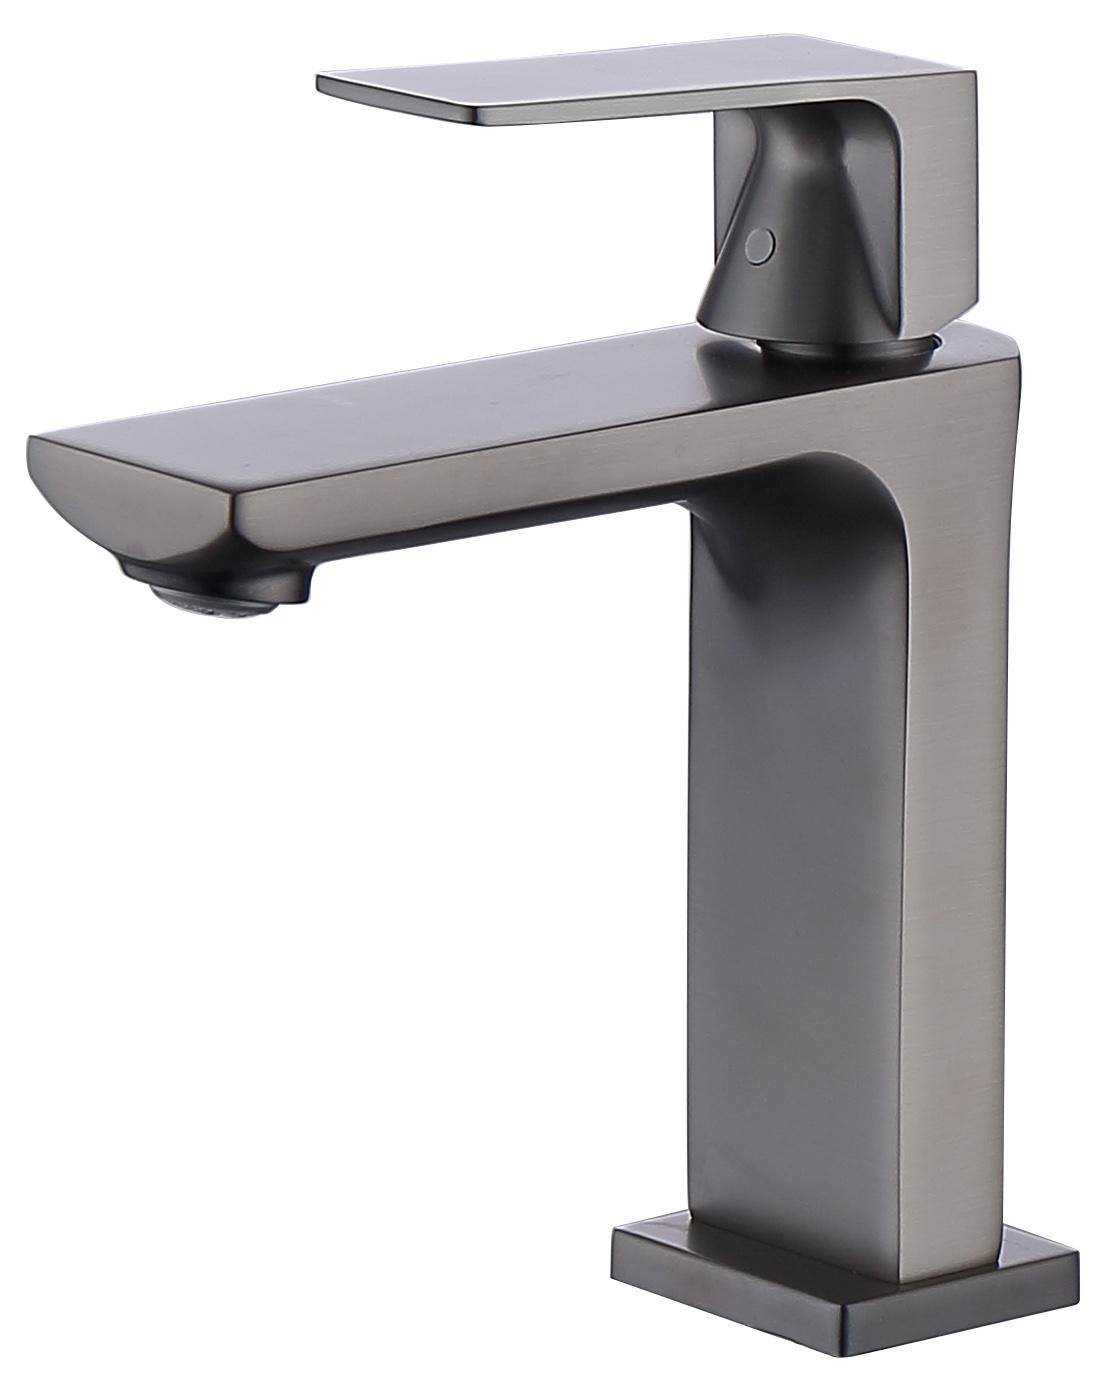 Copper with gray colour Wash Basin Faucet Manufacturers, Copper with gray colour Wash Basin Faucet Factory, Supply Copper with gray colour Wash Basin Faucet